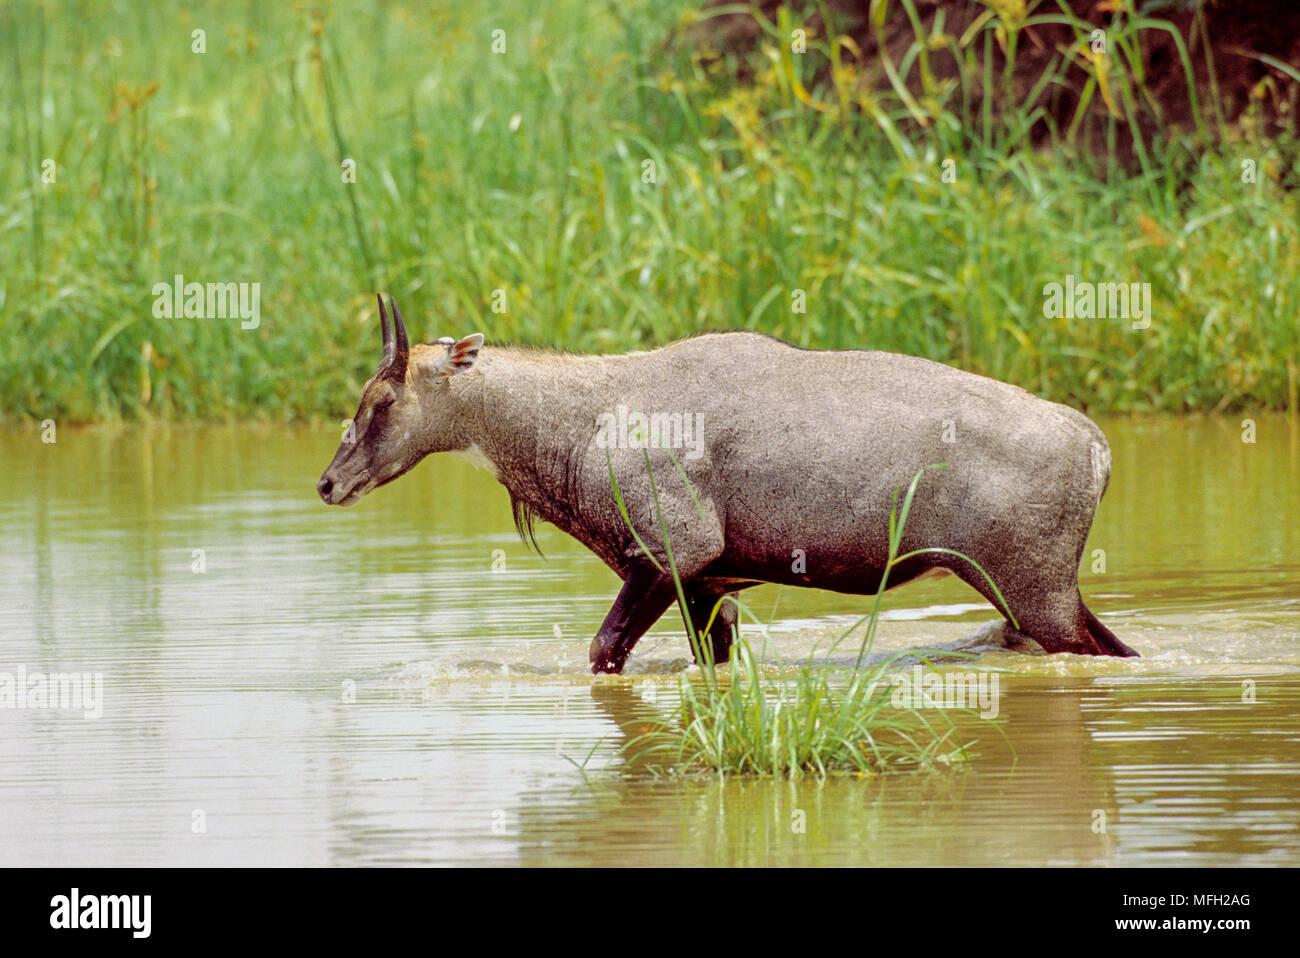 male Nilgai or Blue Bull, (Boselaphus tragocamelus), walking through wetland habitat, Keoladeo Ghana National Park, Bharatpur, Rajasthan, India - Stock Image